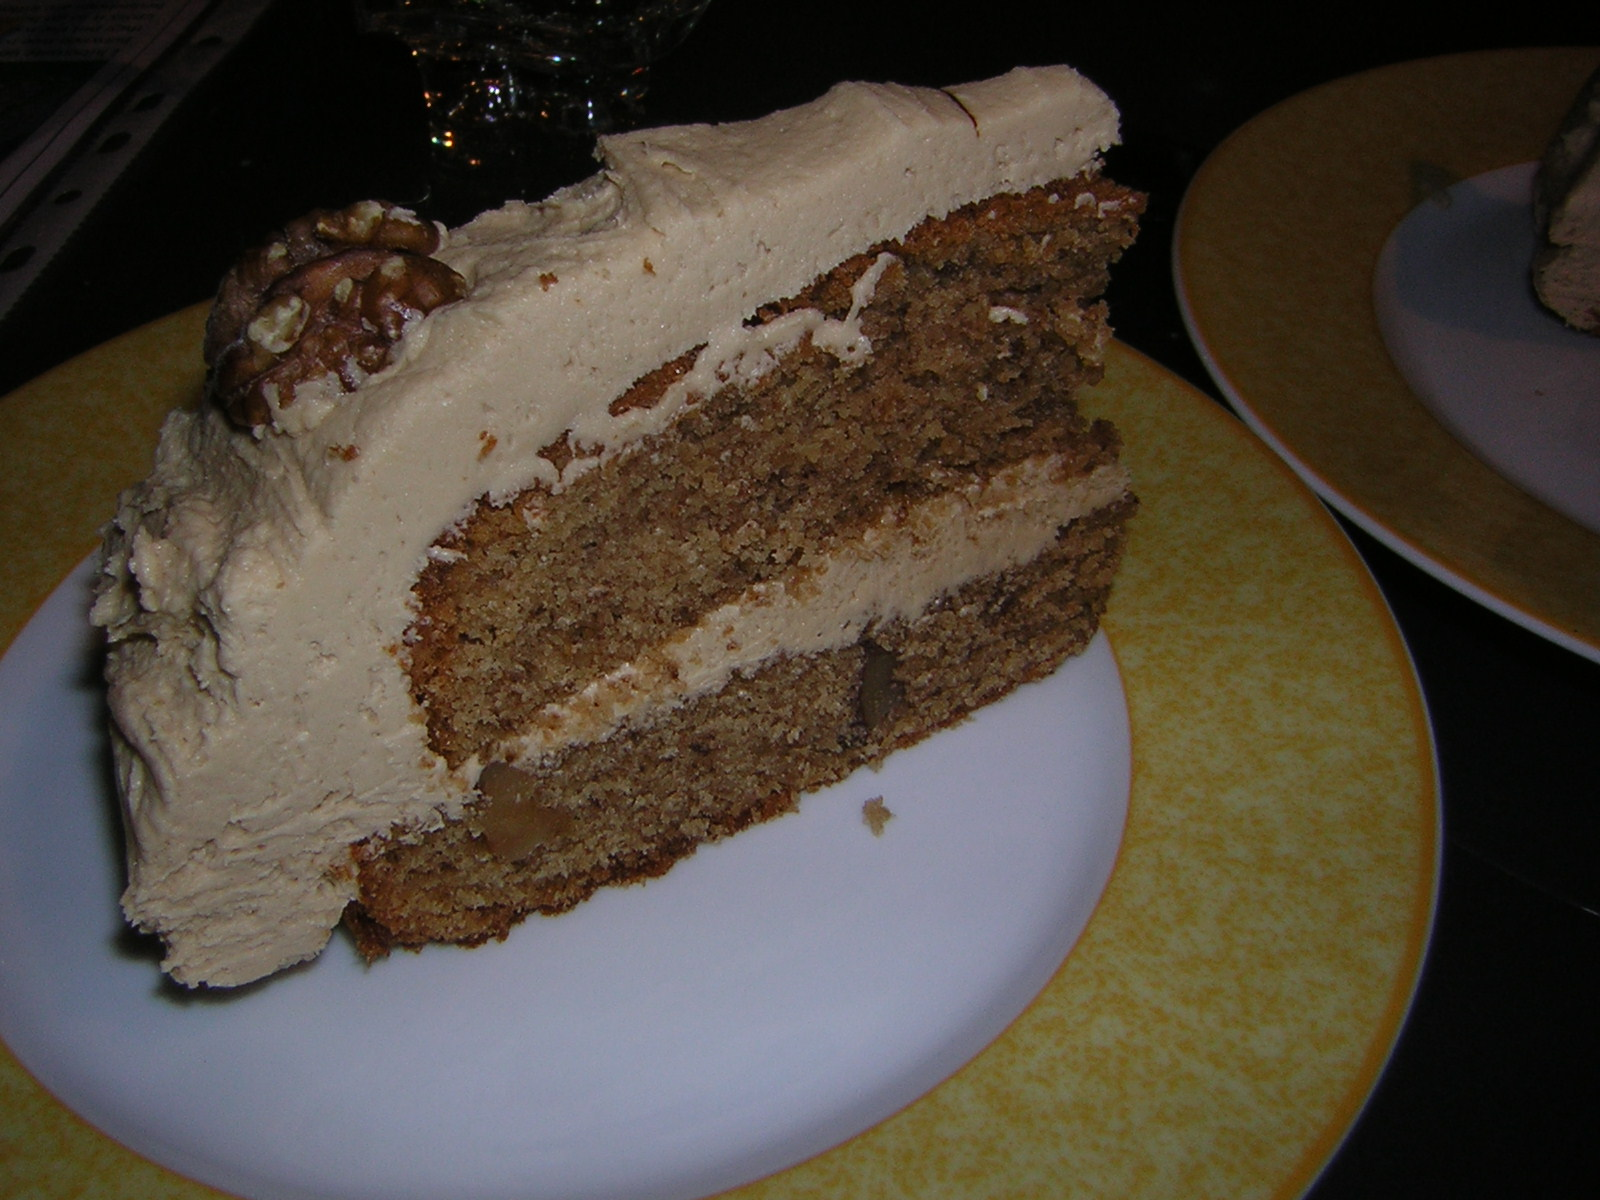 ... Fun and Gluten Free: Special Coffee and Walnut Cake (Gluten Free